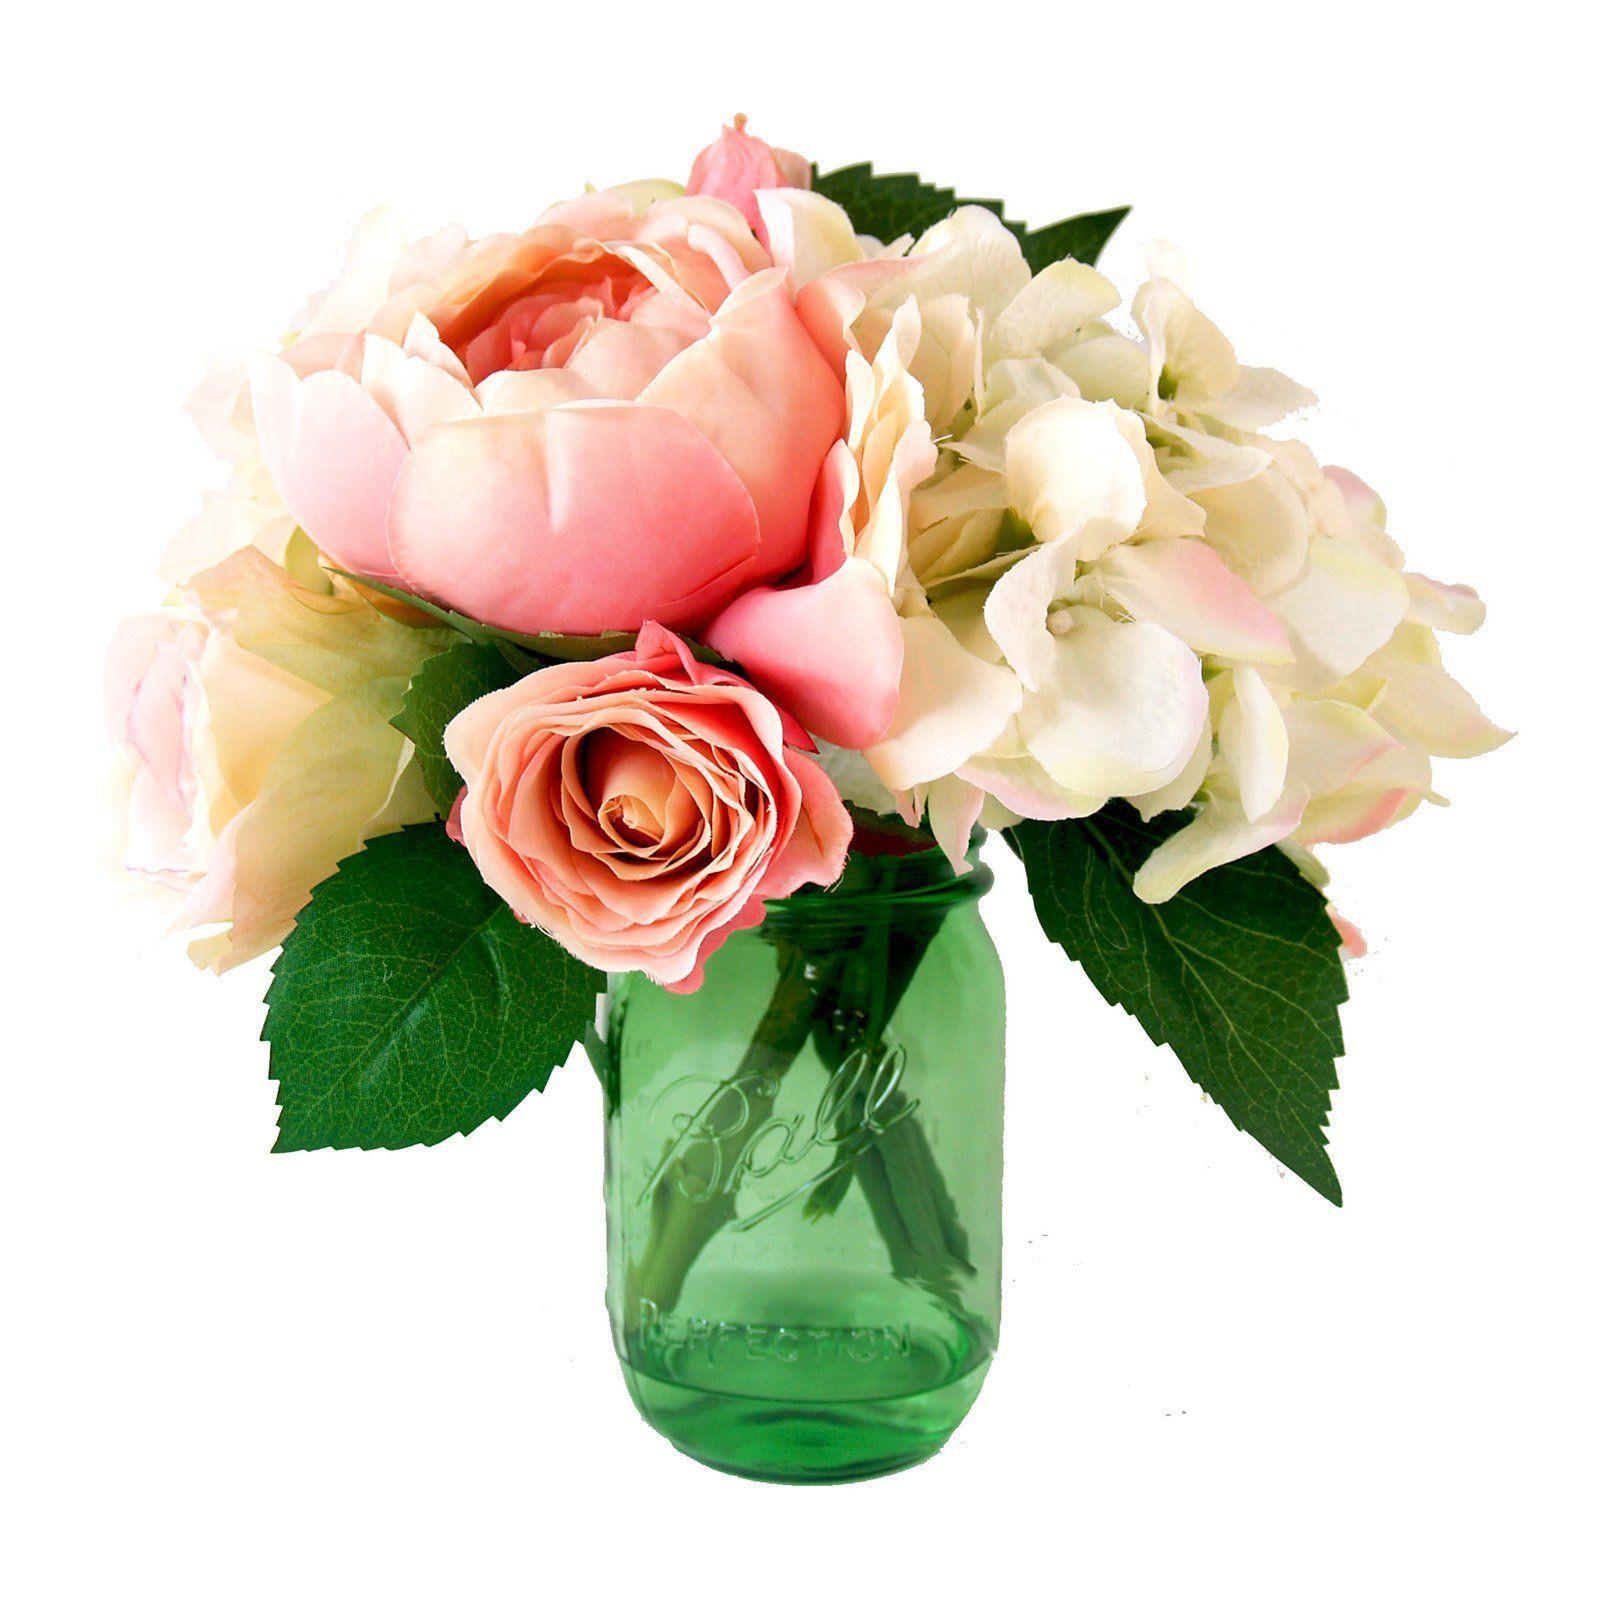 glass vase with silk flowers of creative displays designs mixed floral silk flower bouquet throughout creative displays designs mixed floral silk flower bouquet cdfl1249